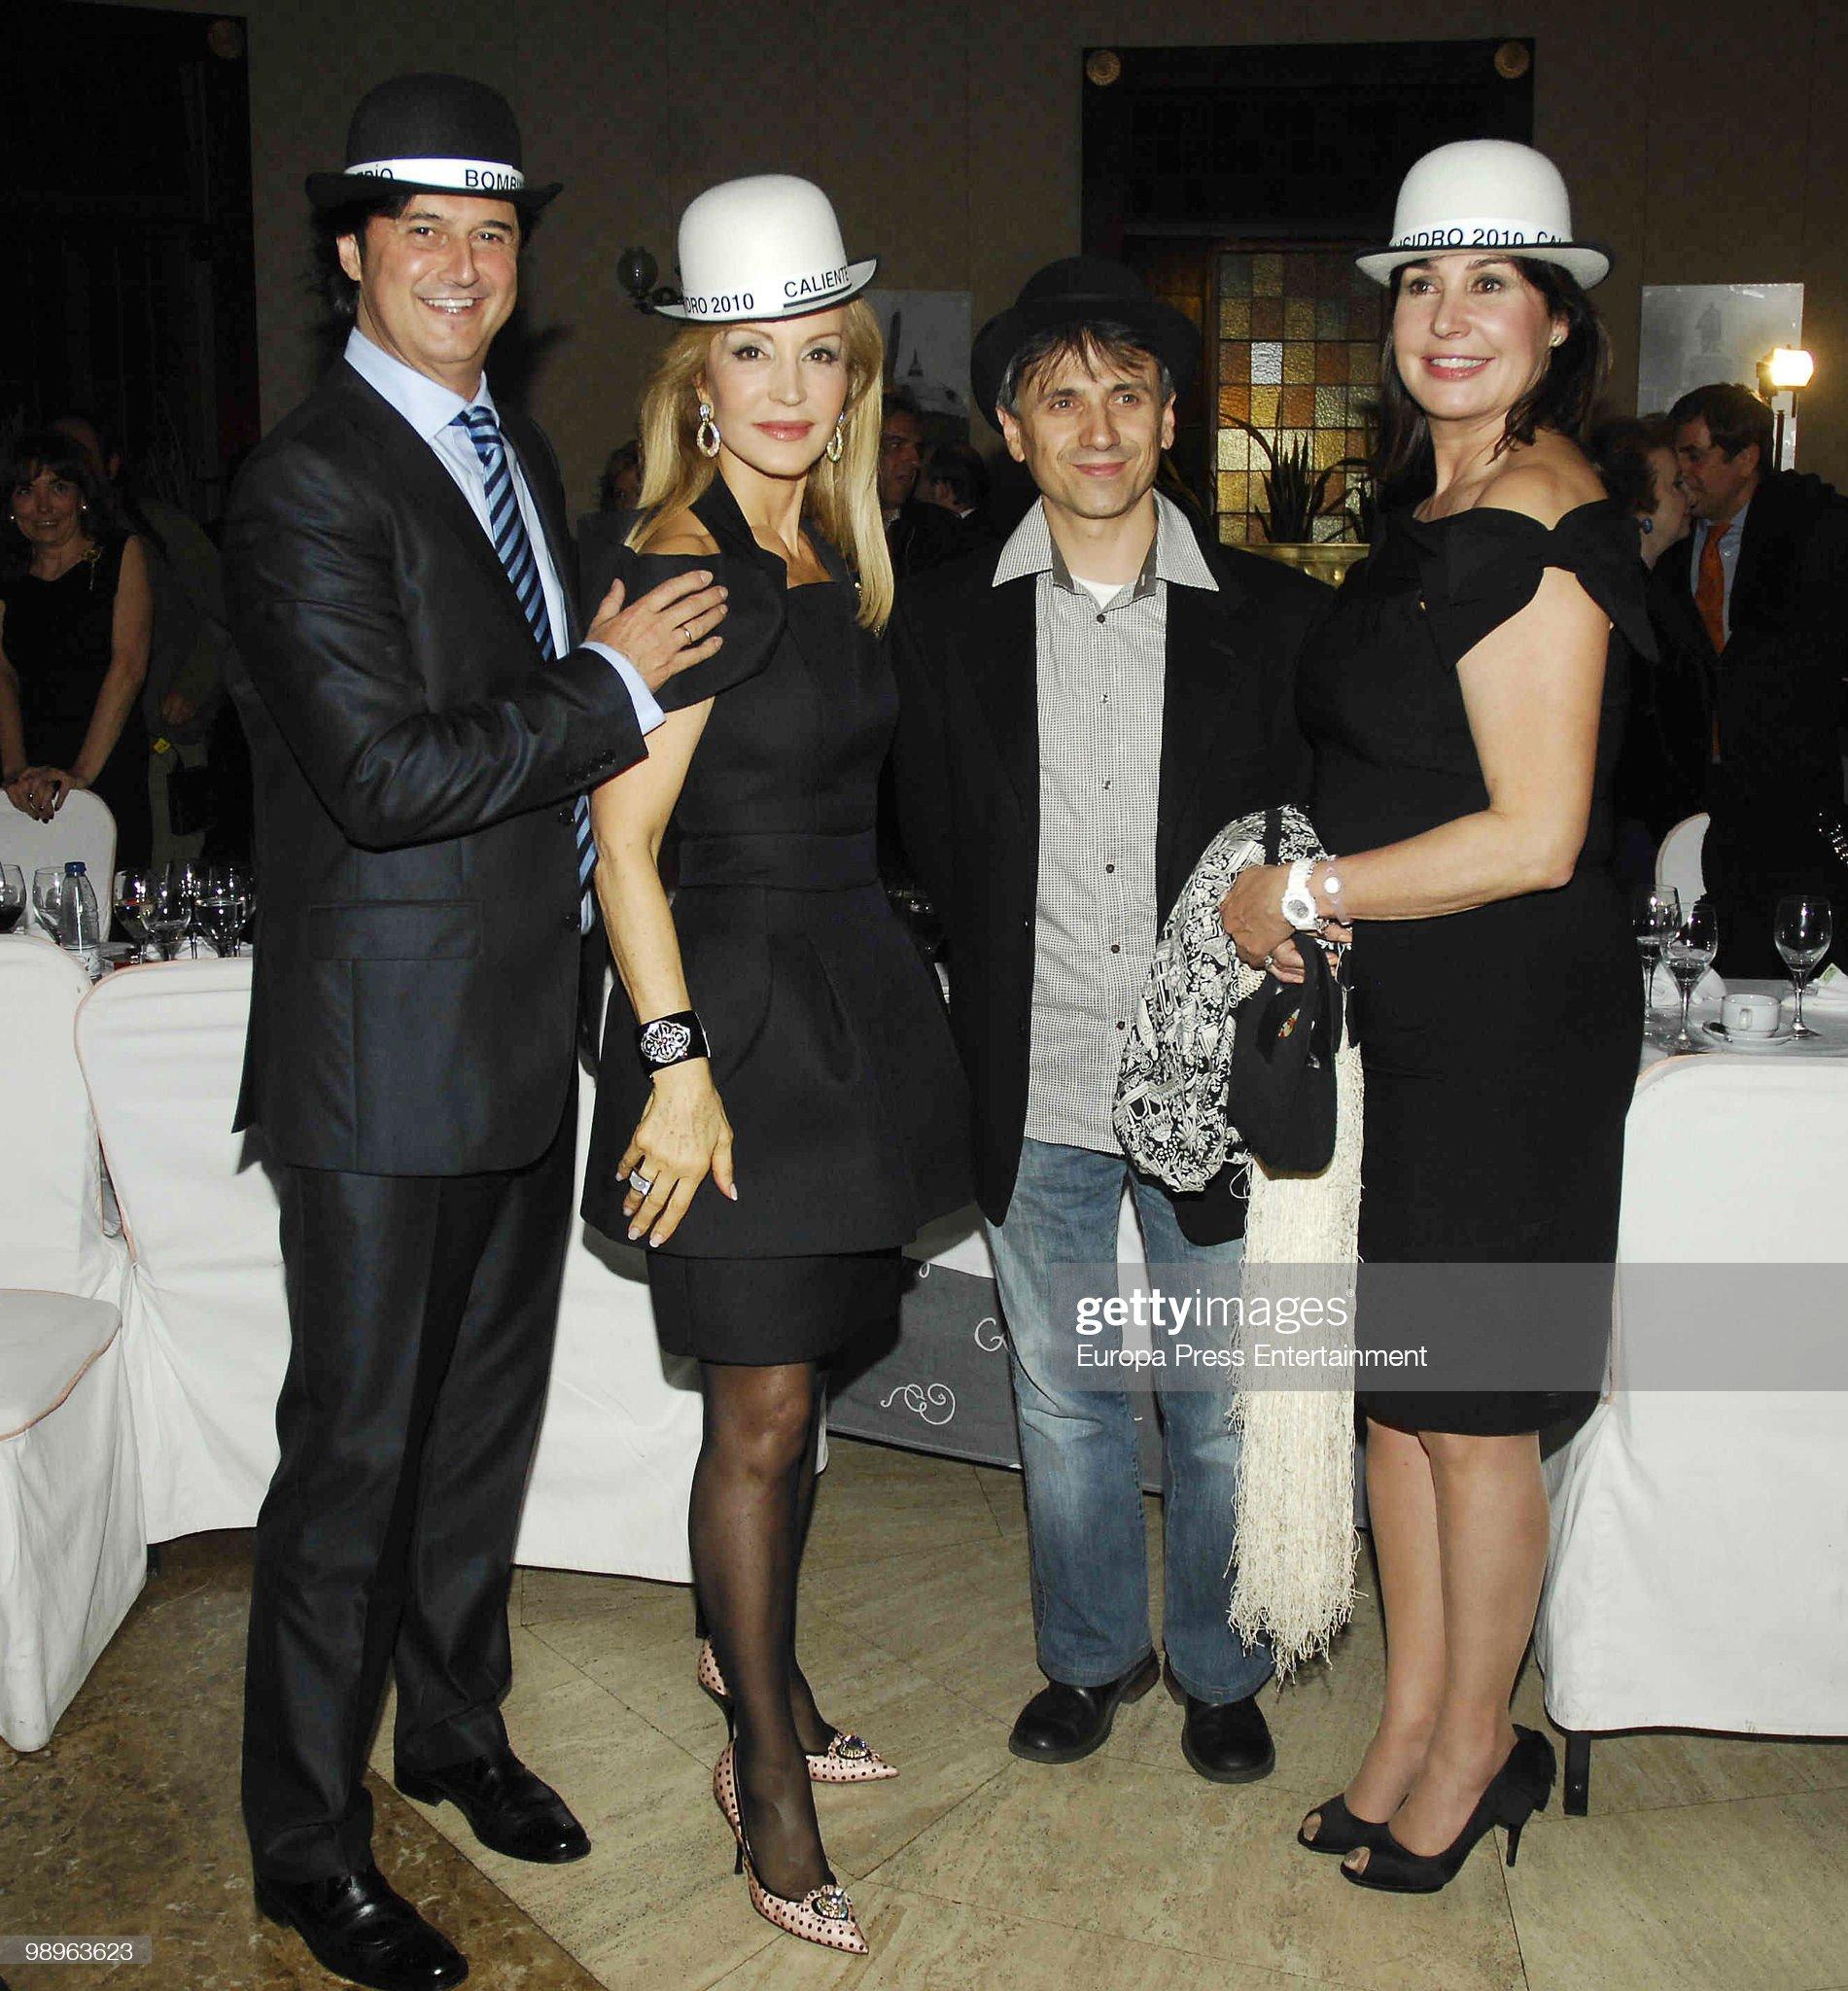 ¿Cuánto mide Carmen Lomana? - Altura Javier-castillo-poty-carmen-lomana-jose-mota-and-carmen-martinez-picture-id98963623?s=2048x2048